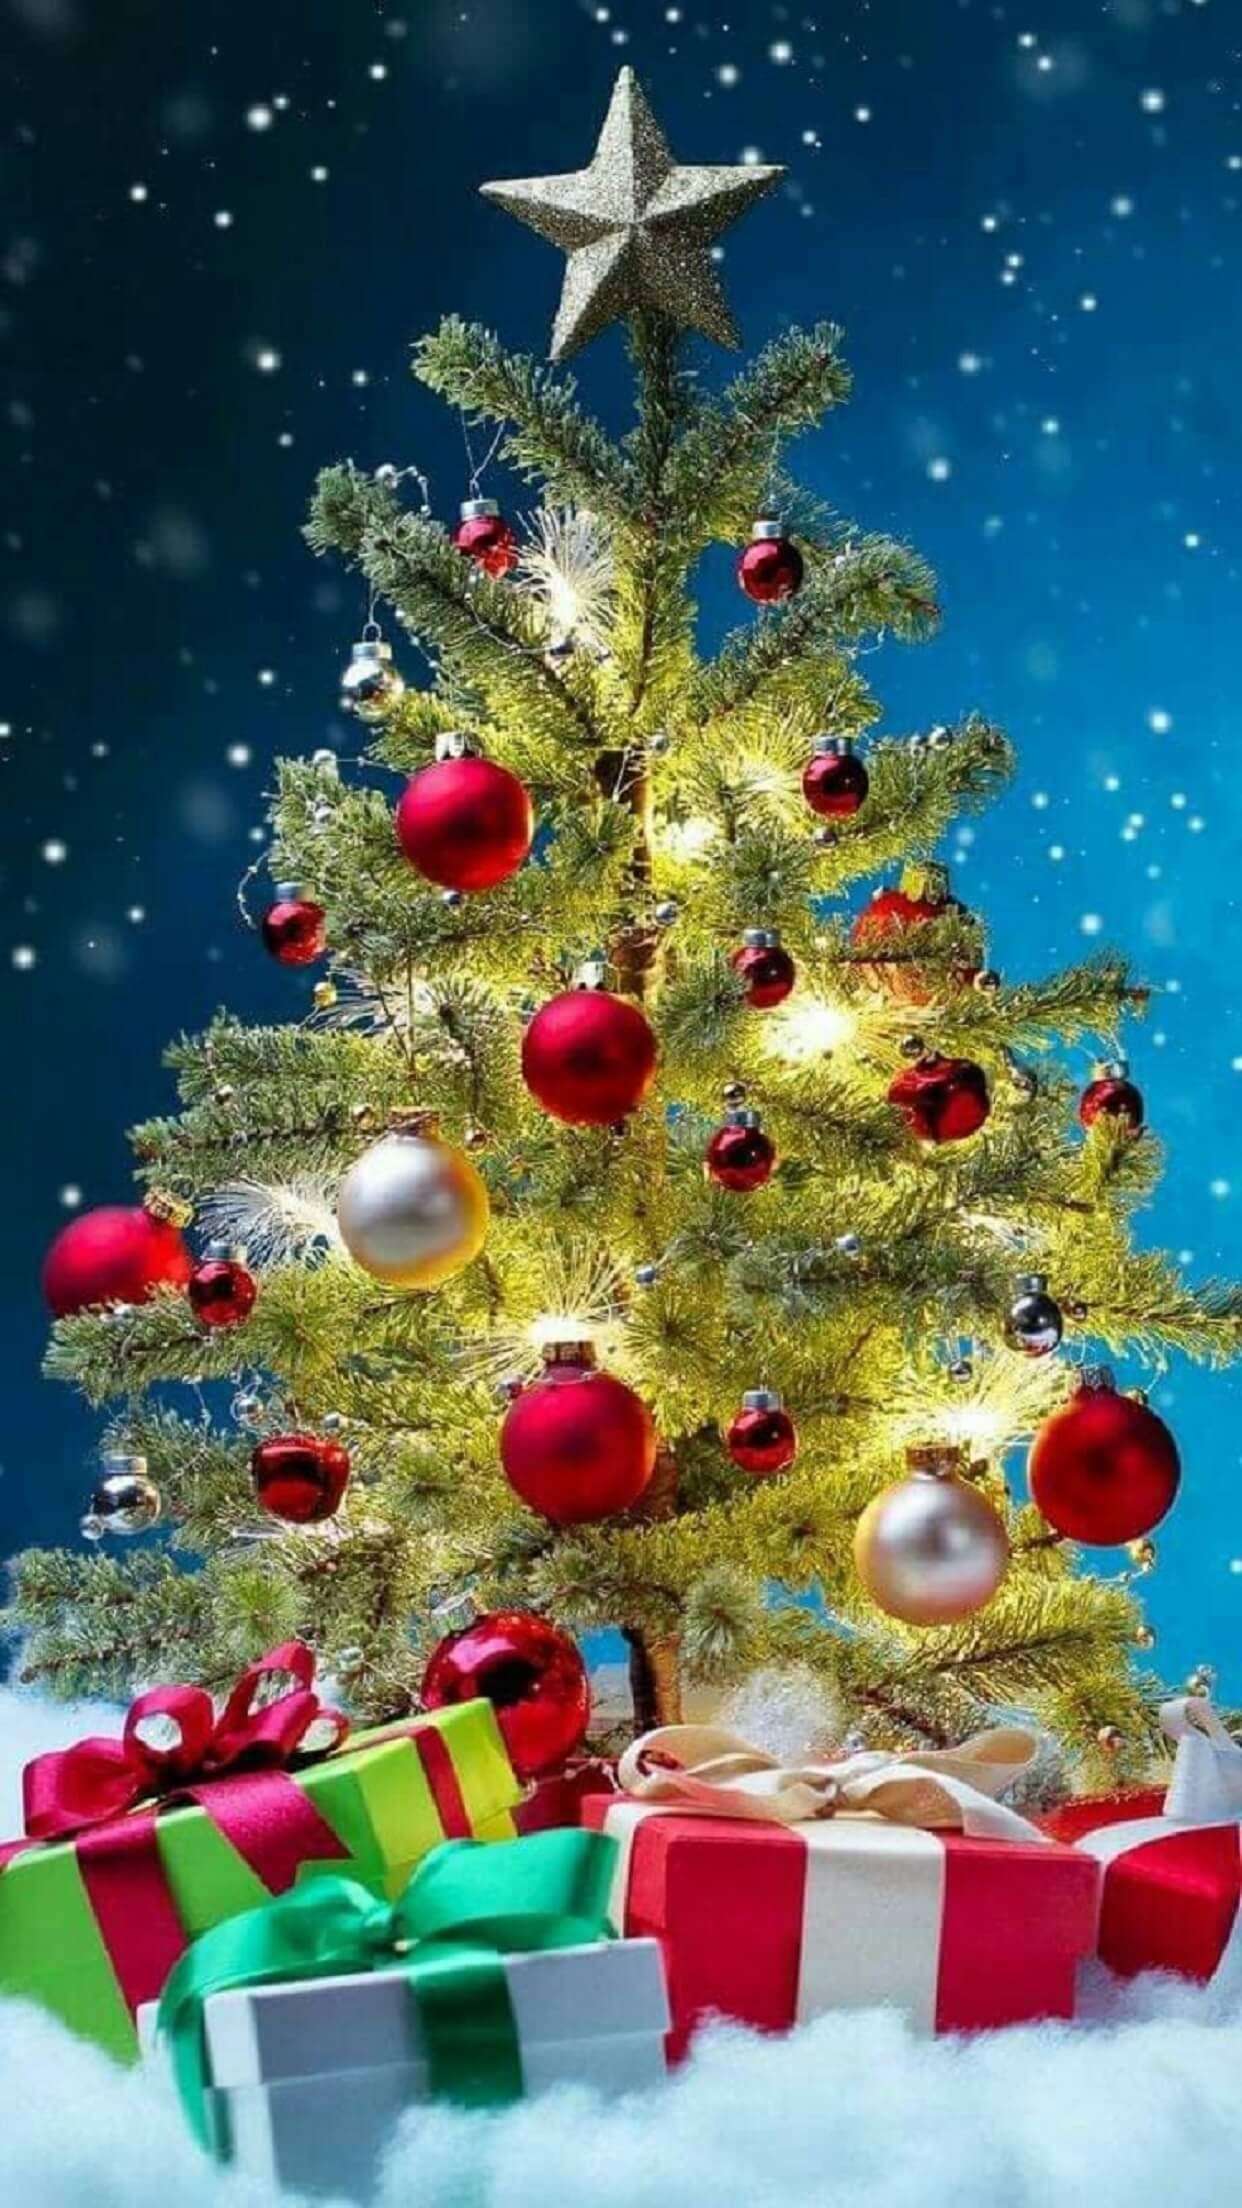 Iphone Wallpaper 02 Wallpaper Iphone Christmas Christmas Tree Wallpaper Merry Christmas Wallpaper Feliz natal wallpaper hd